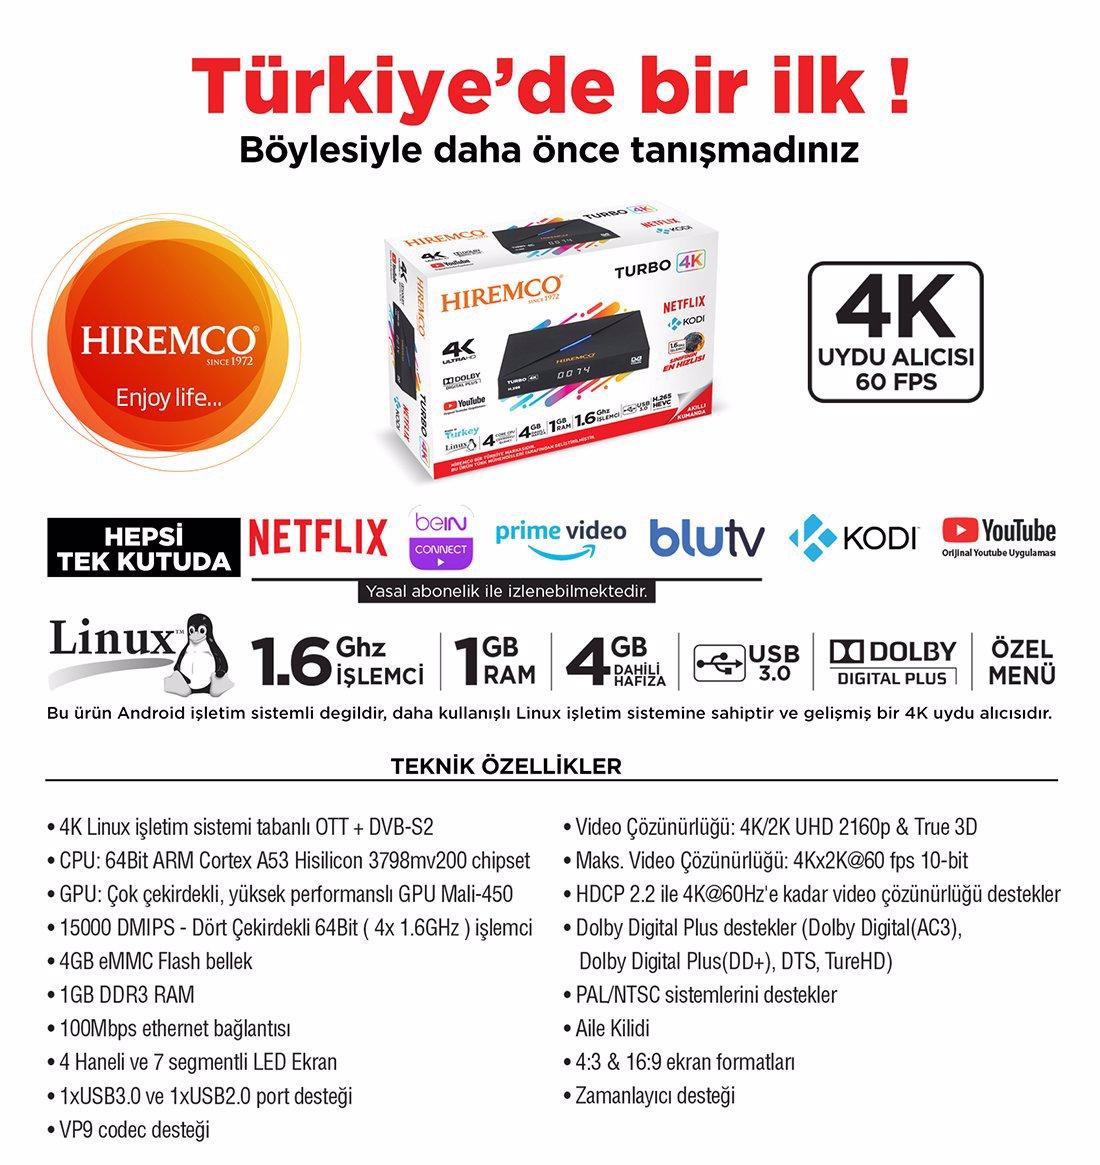 Hiremco Turbo TV Android Box